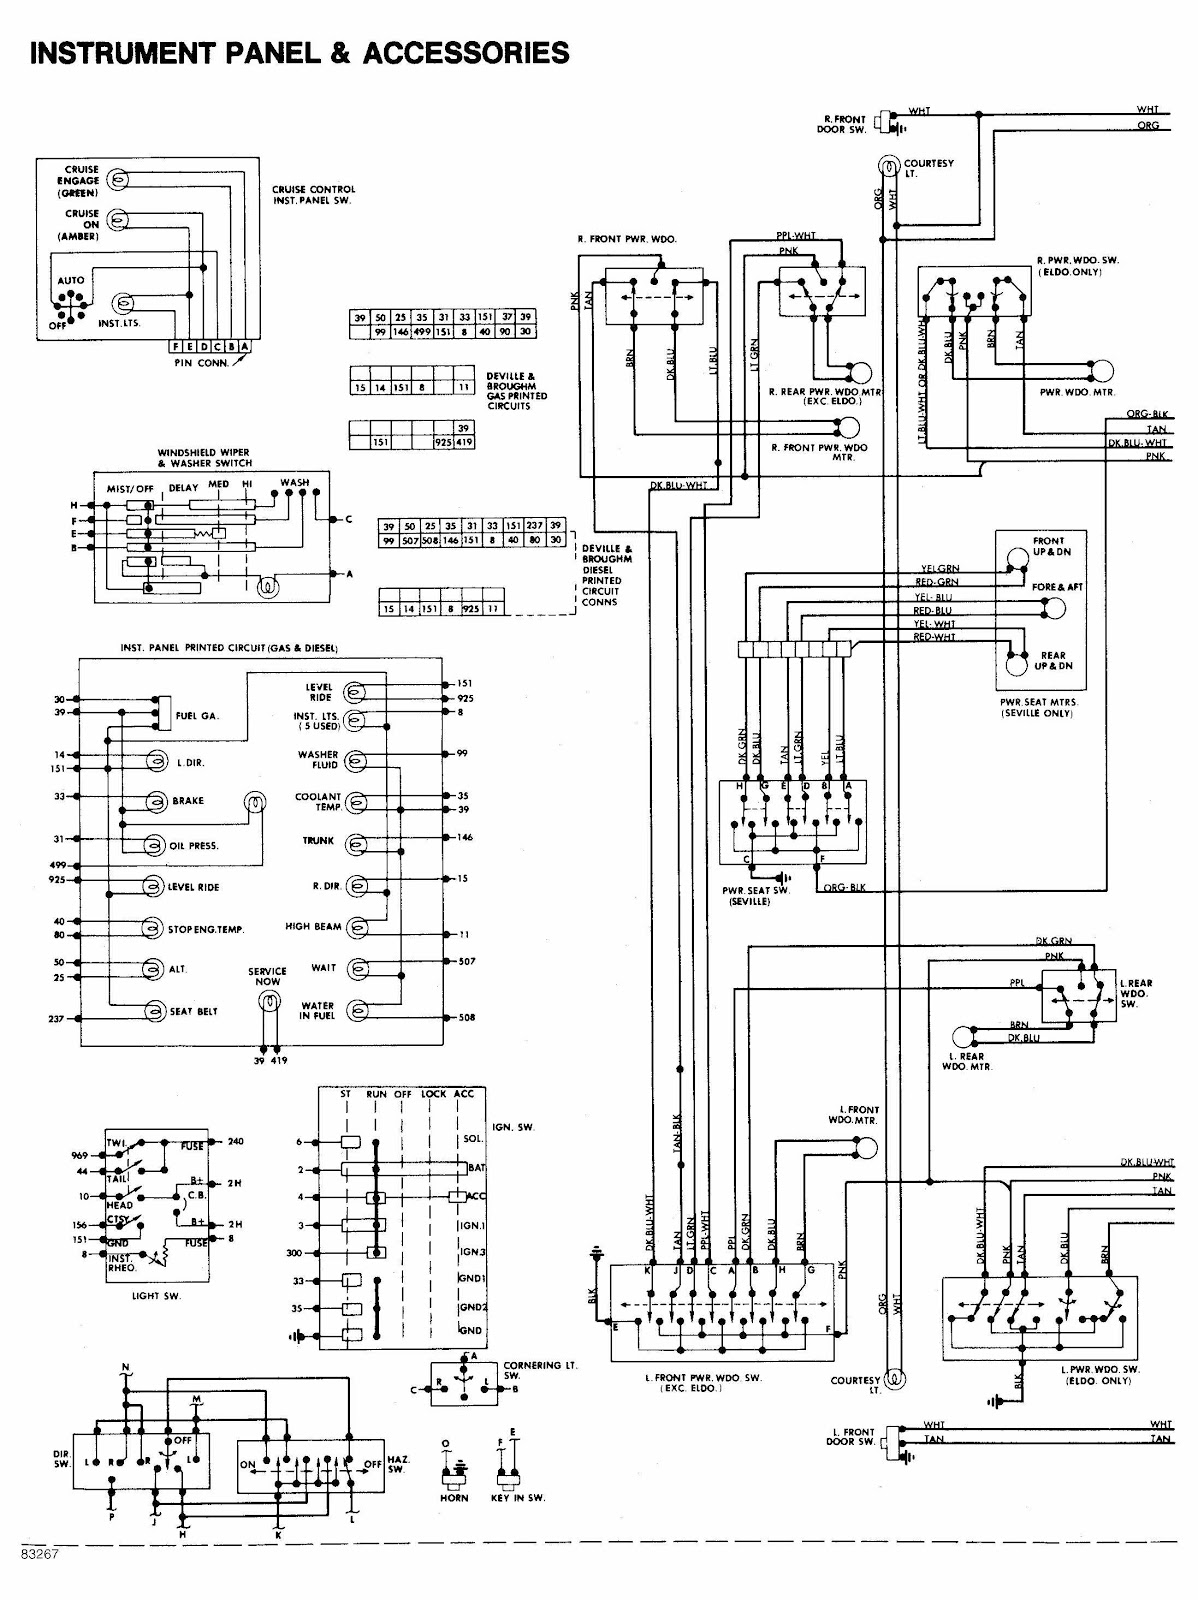 cadillac de ville 1984 instrument panel and accessories 1962 cadillac wiring 1962 cadillac wiring [ 1198 x 1600 Pixel ]